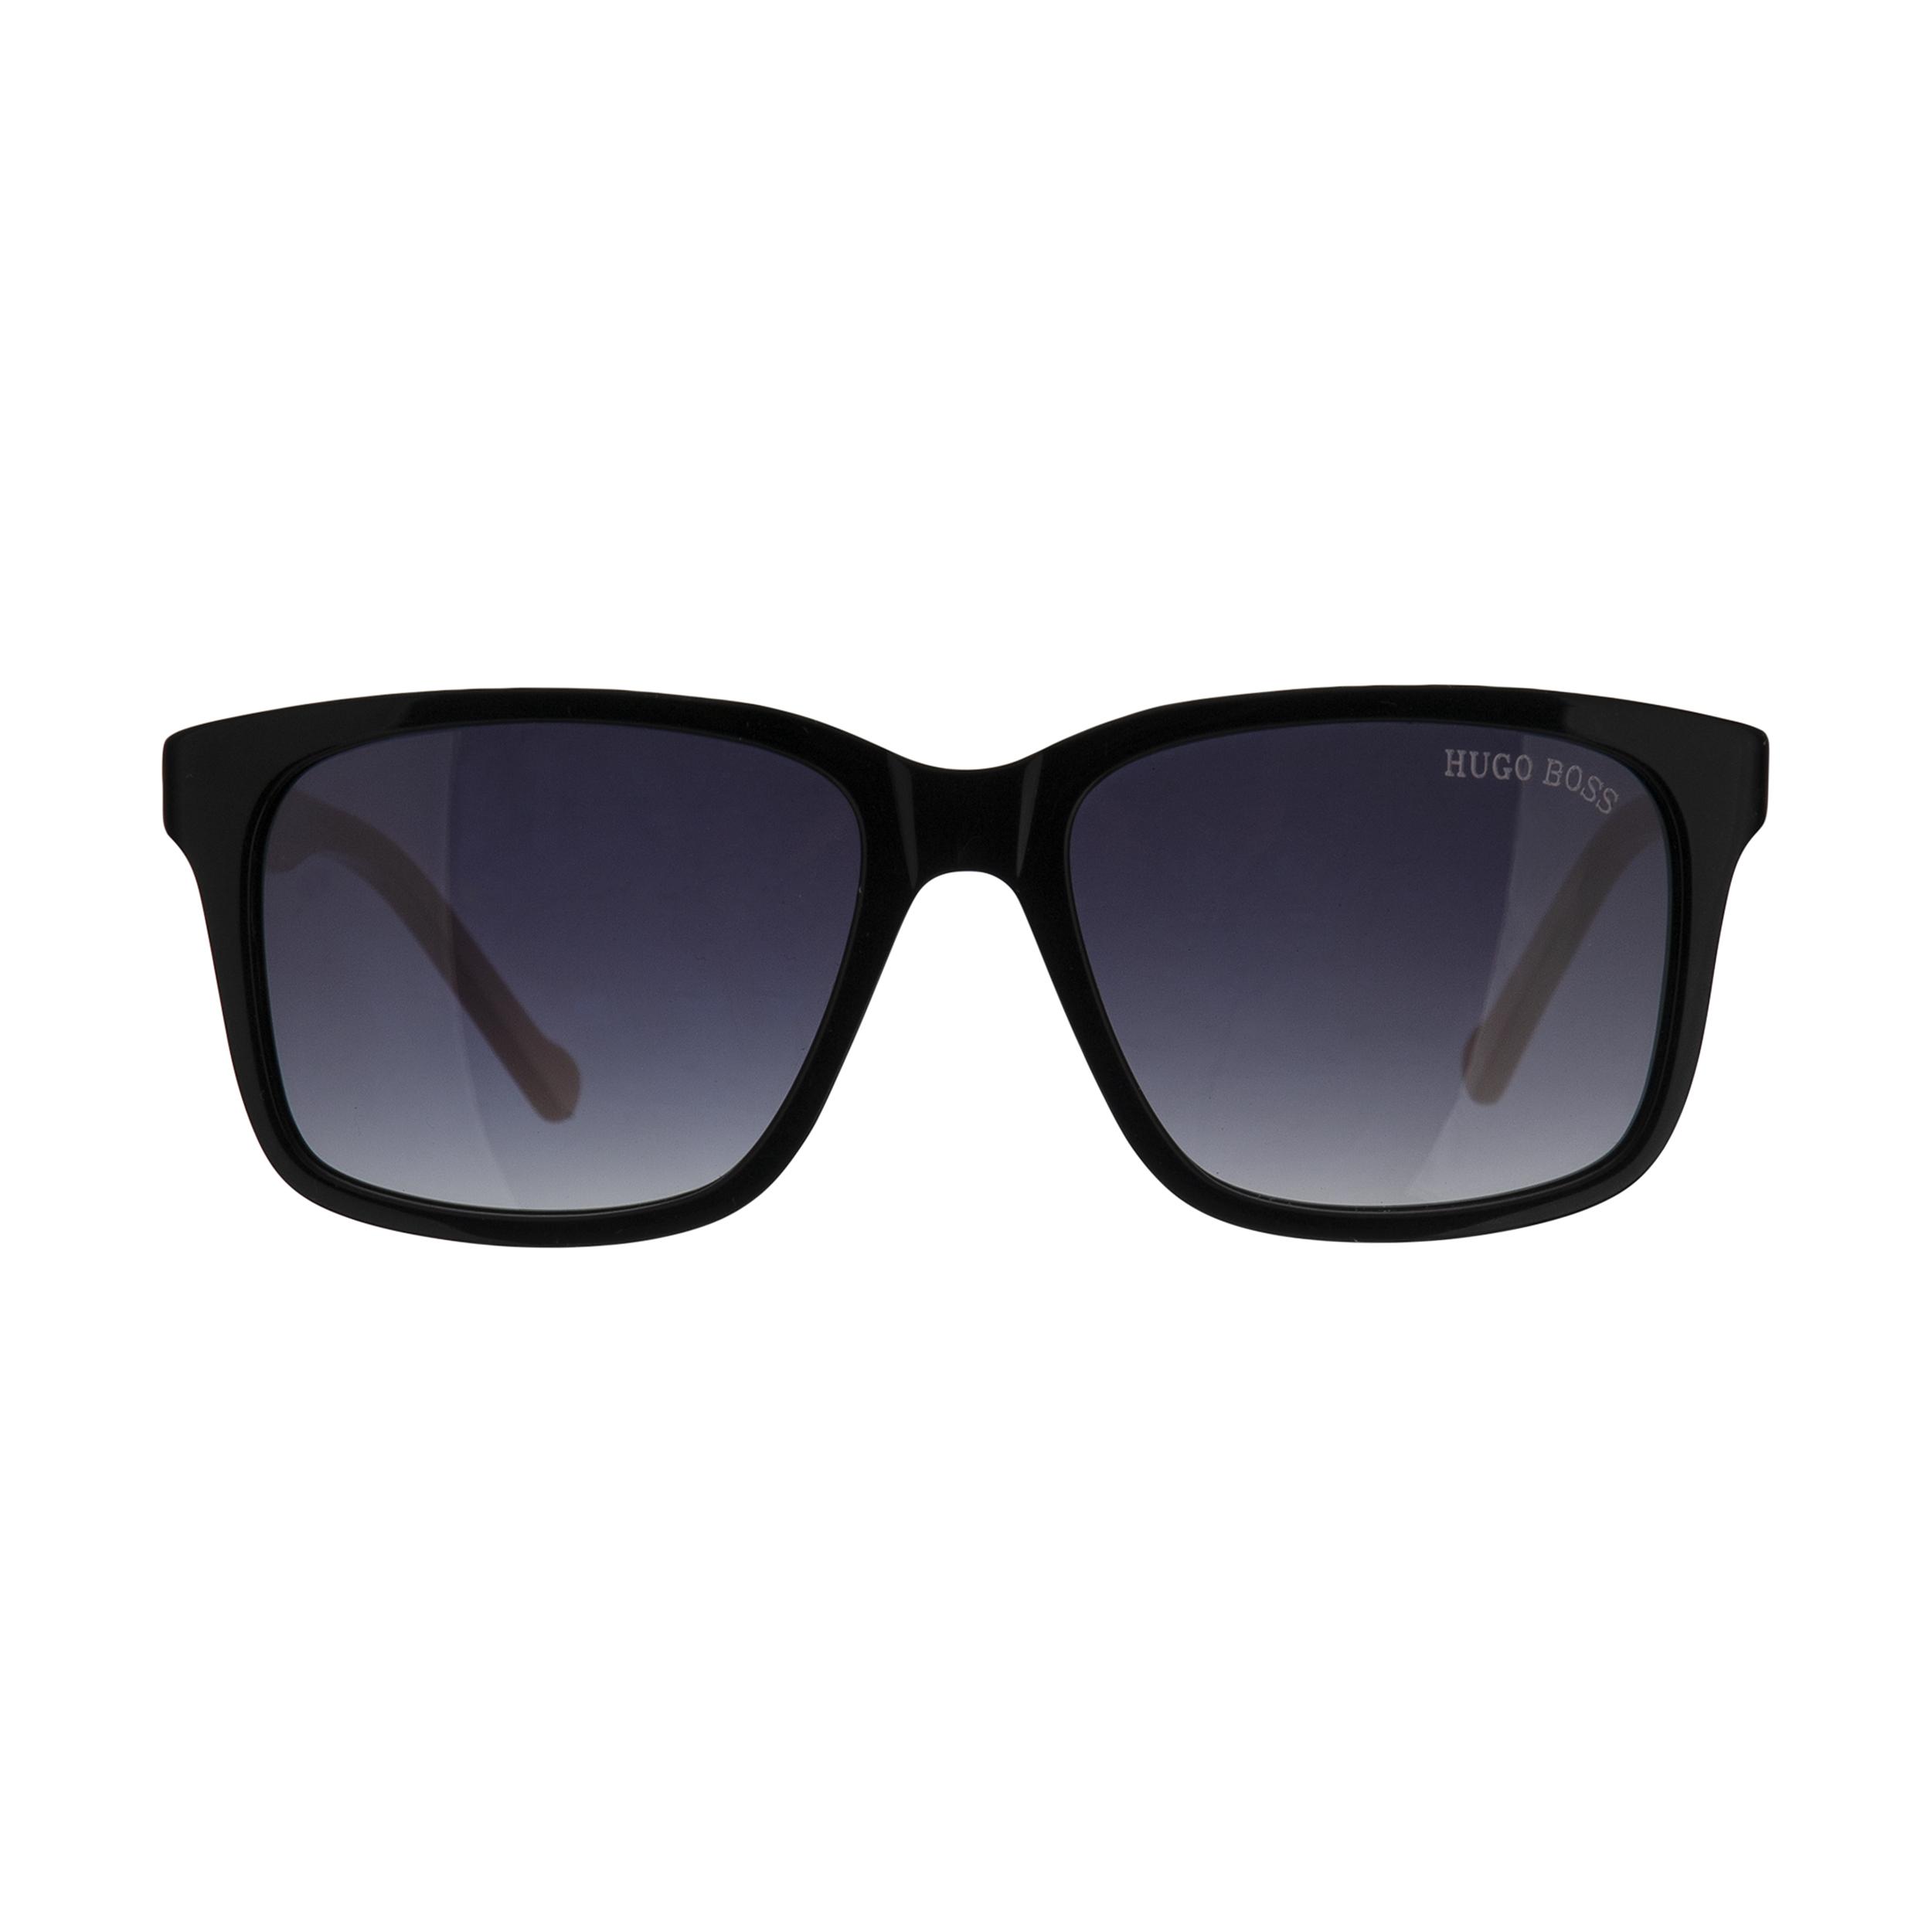 عینک آفتابی هوگو باس مدل 131